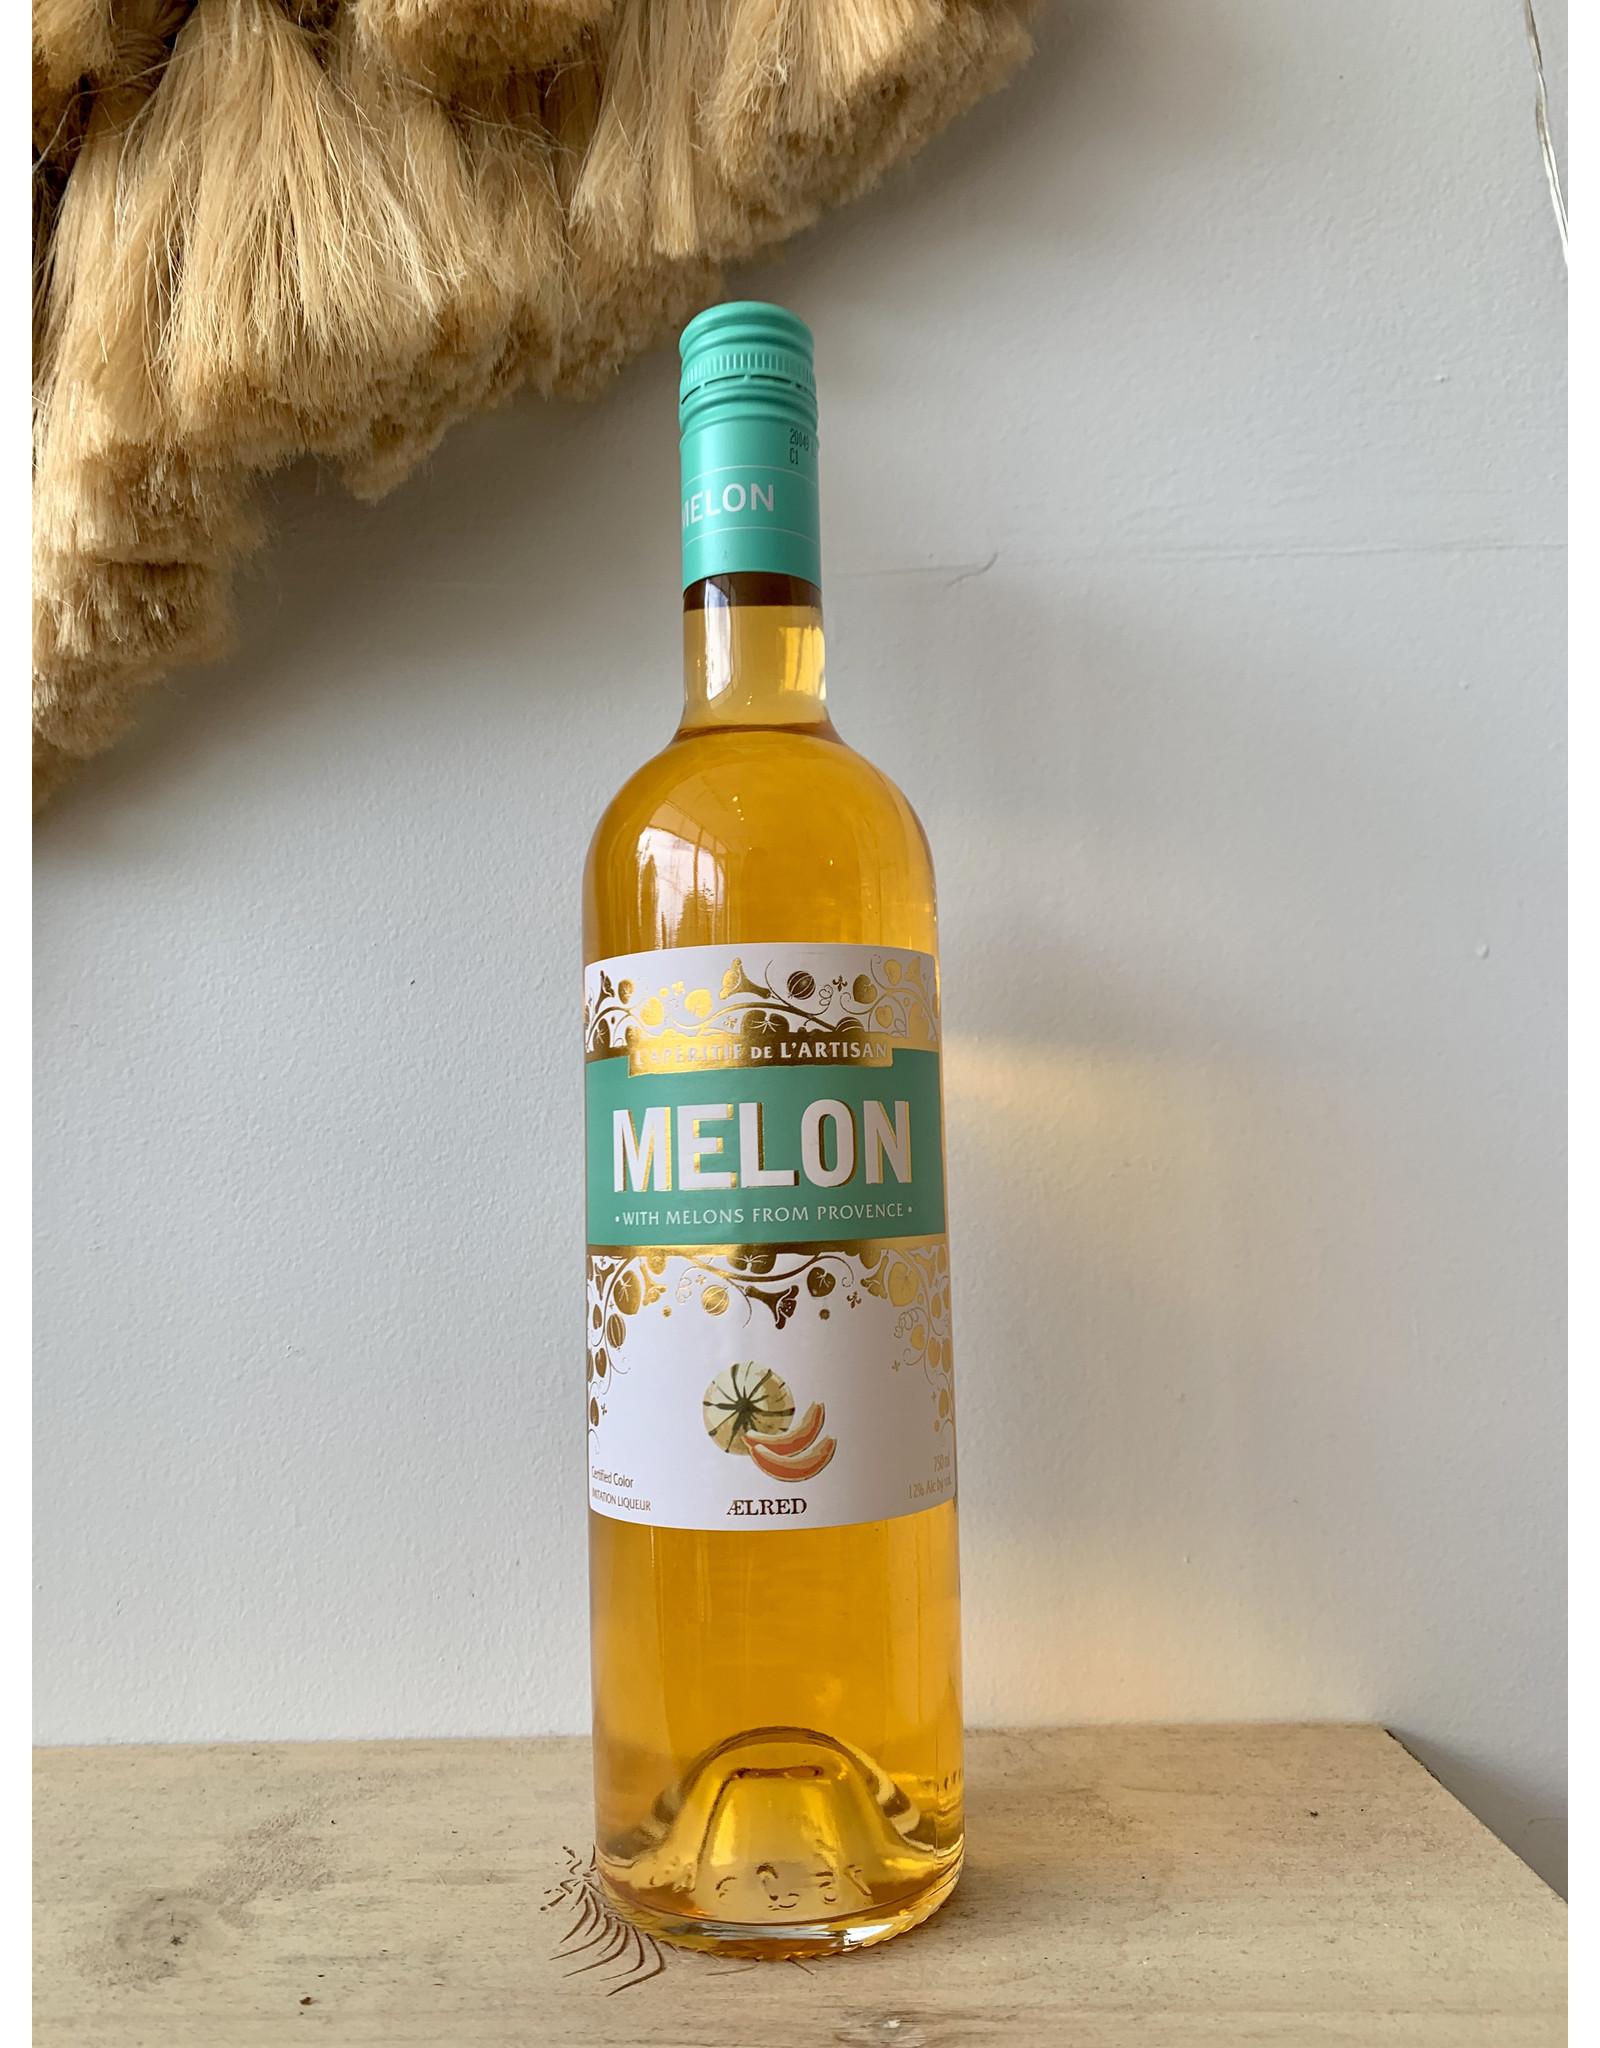 Aelred Melon Aperitif